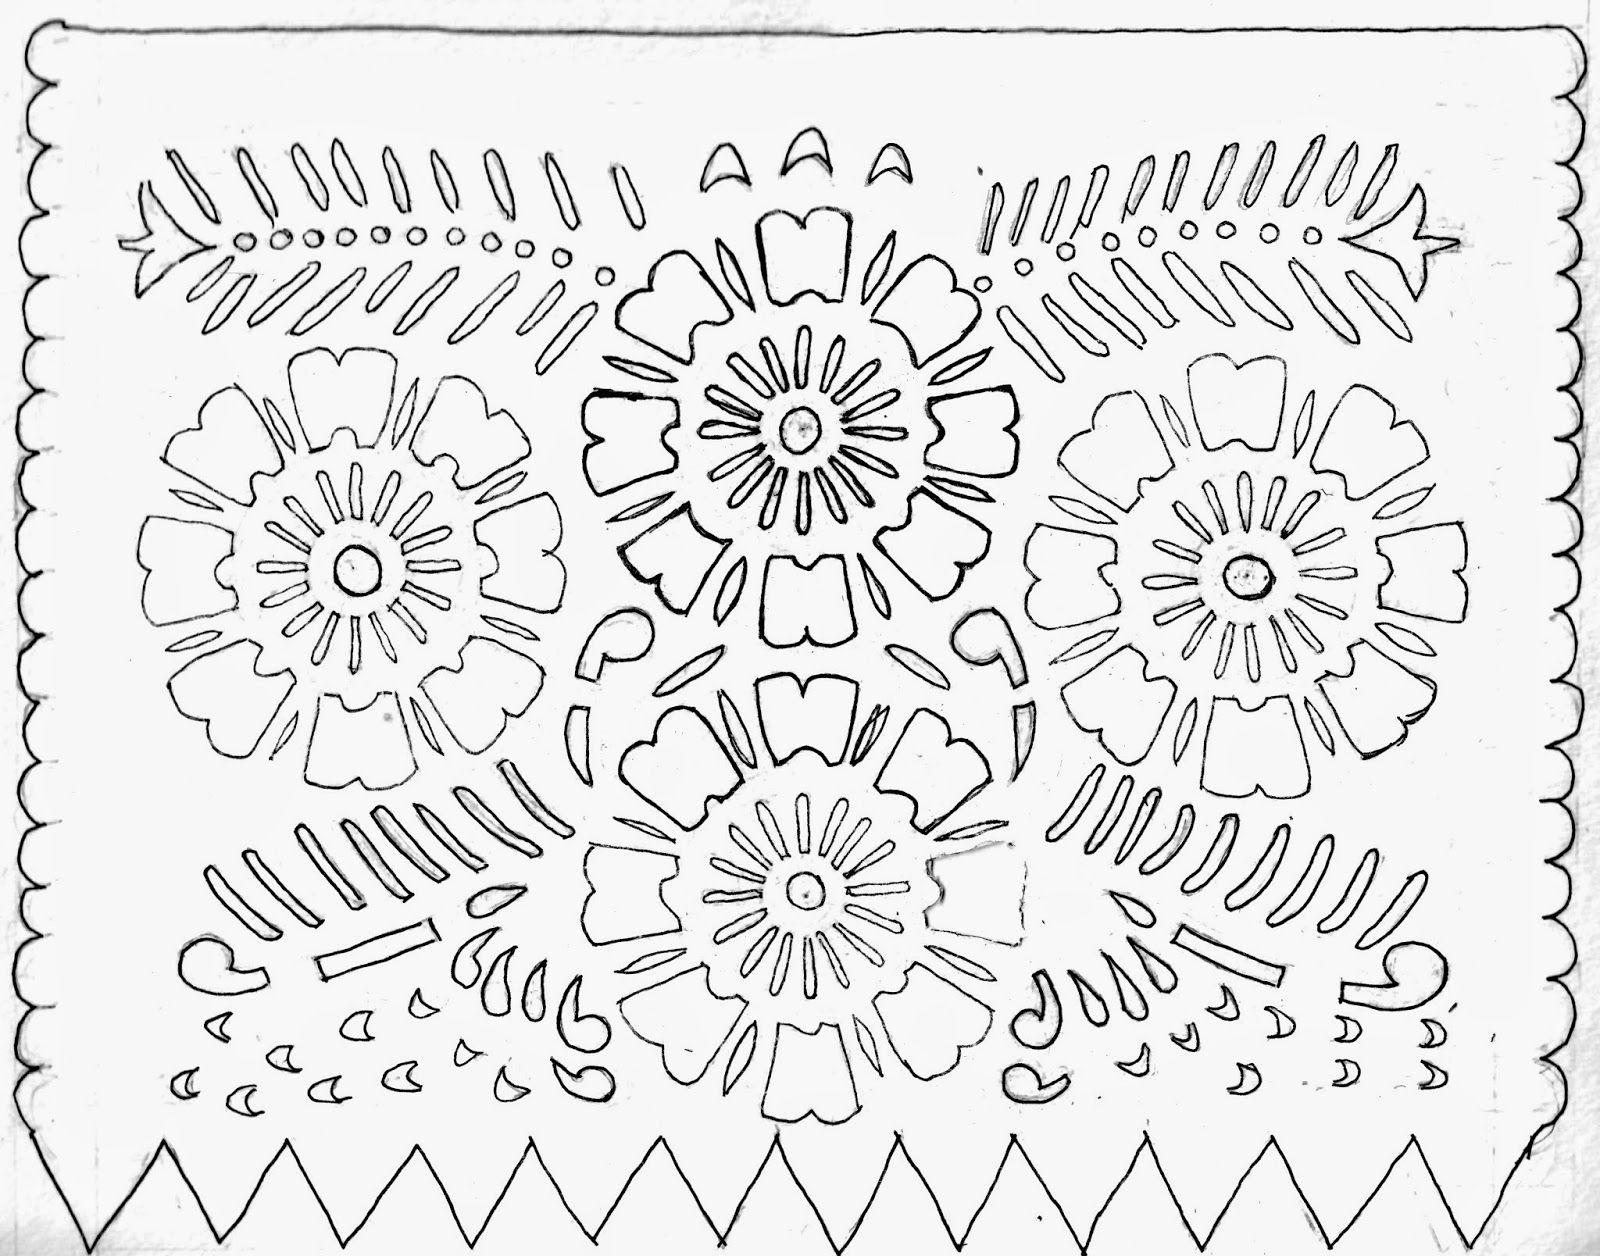 photo about Papel Picado Printable identified as Picture final result for papel picado dia de los muertos templates